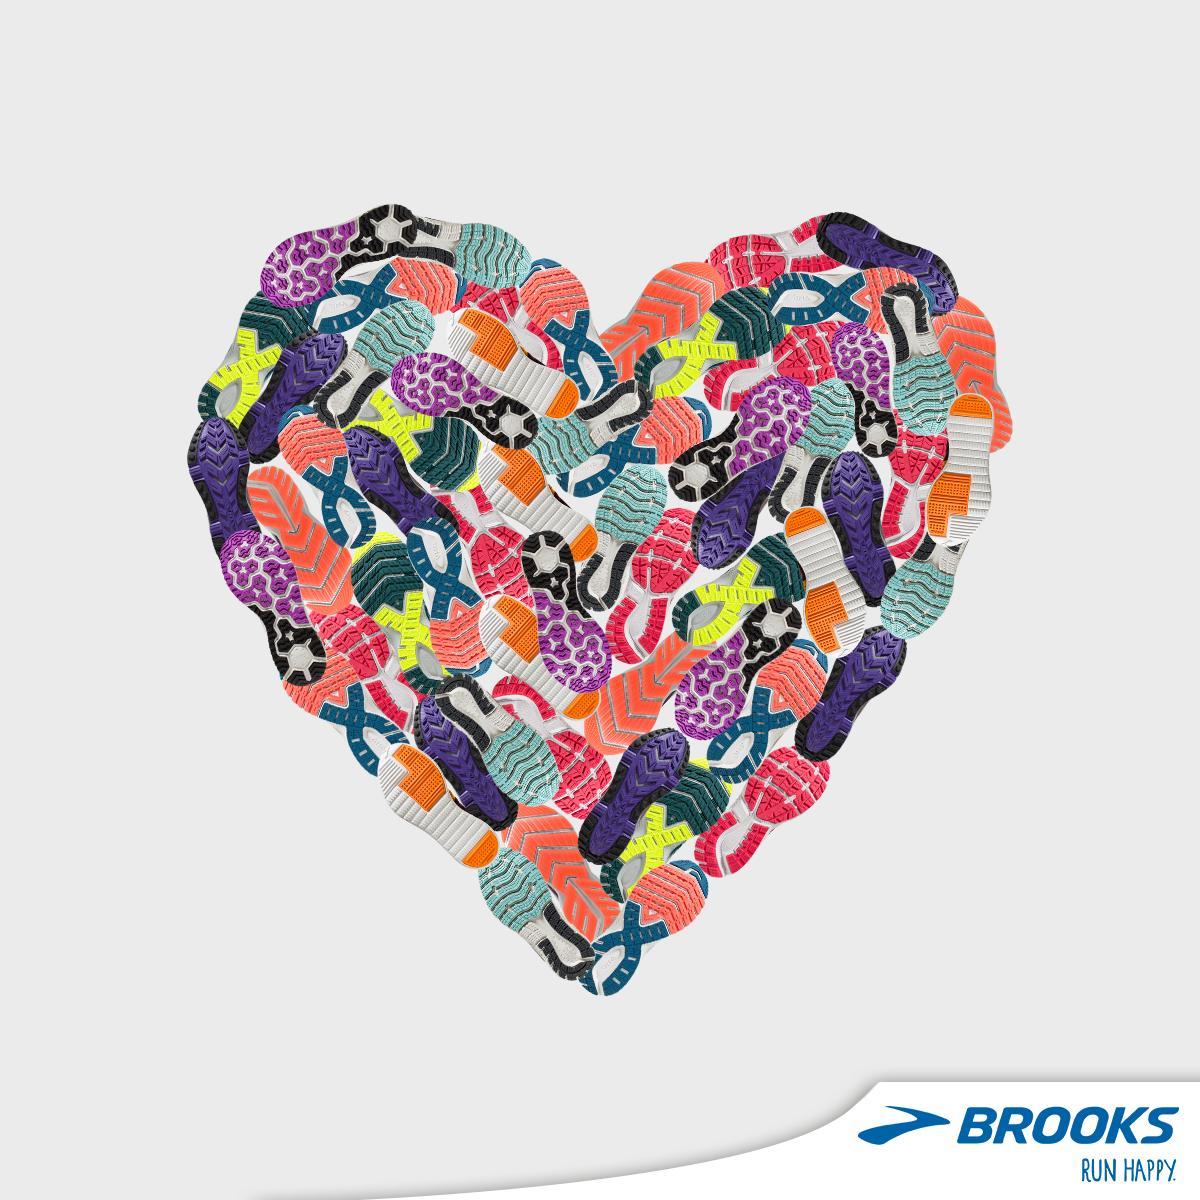 7ec54b99caa Brooks Running SA on Twitter